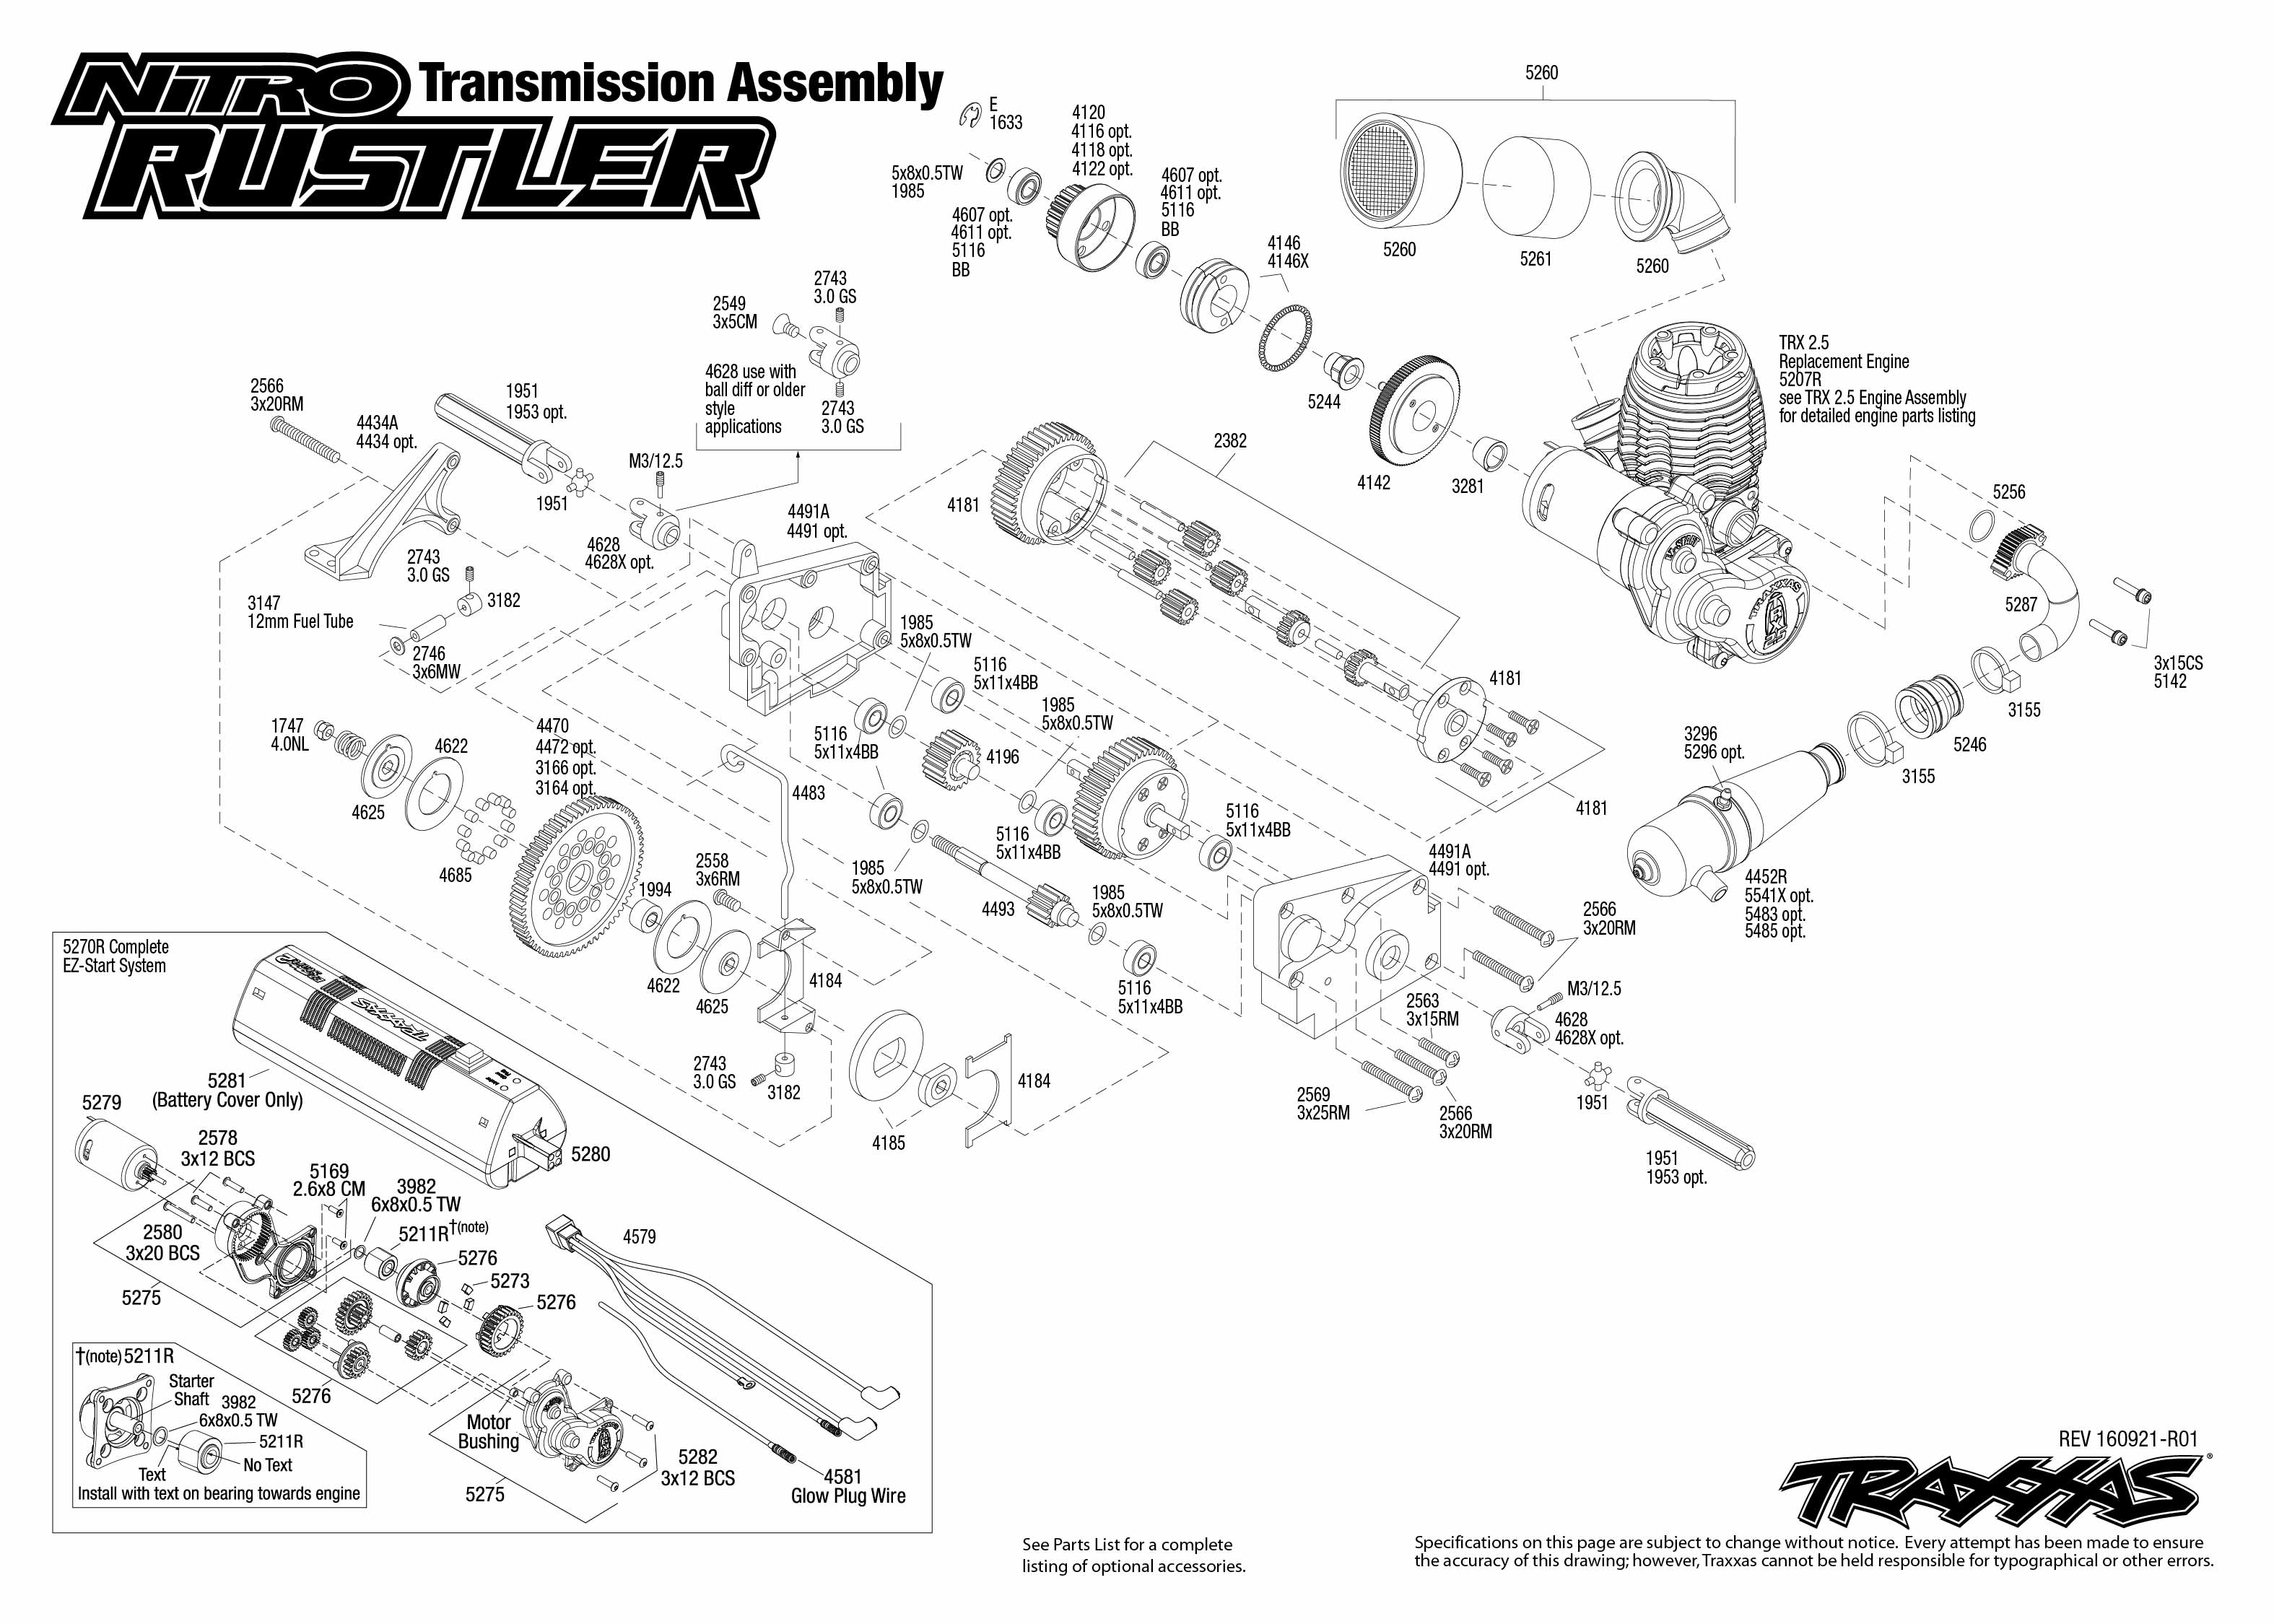 Nitro Rustler 3 Transmission Assembly